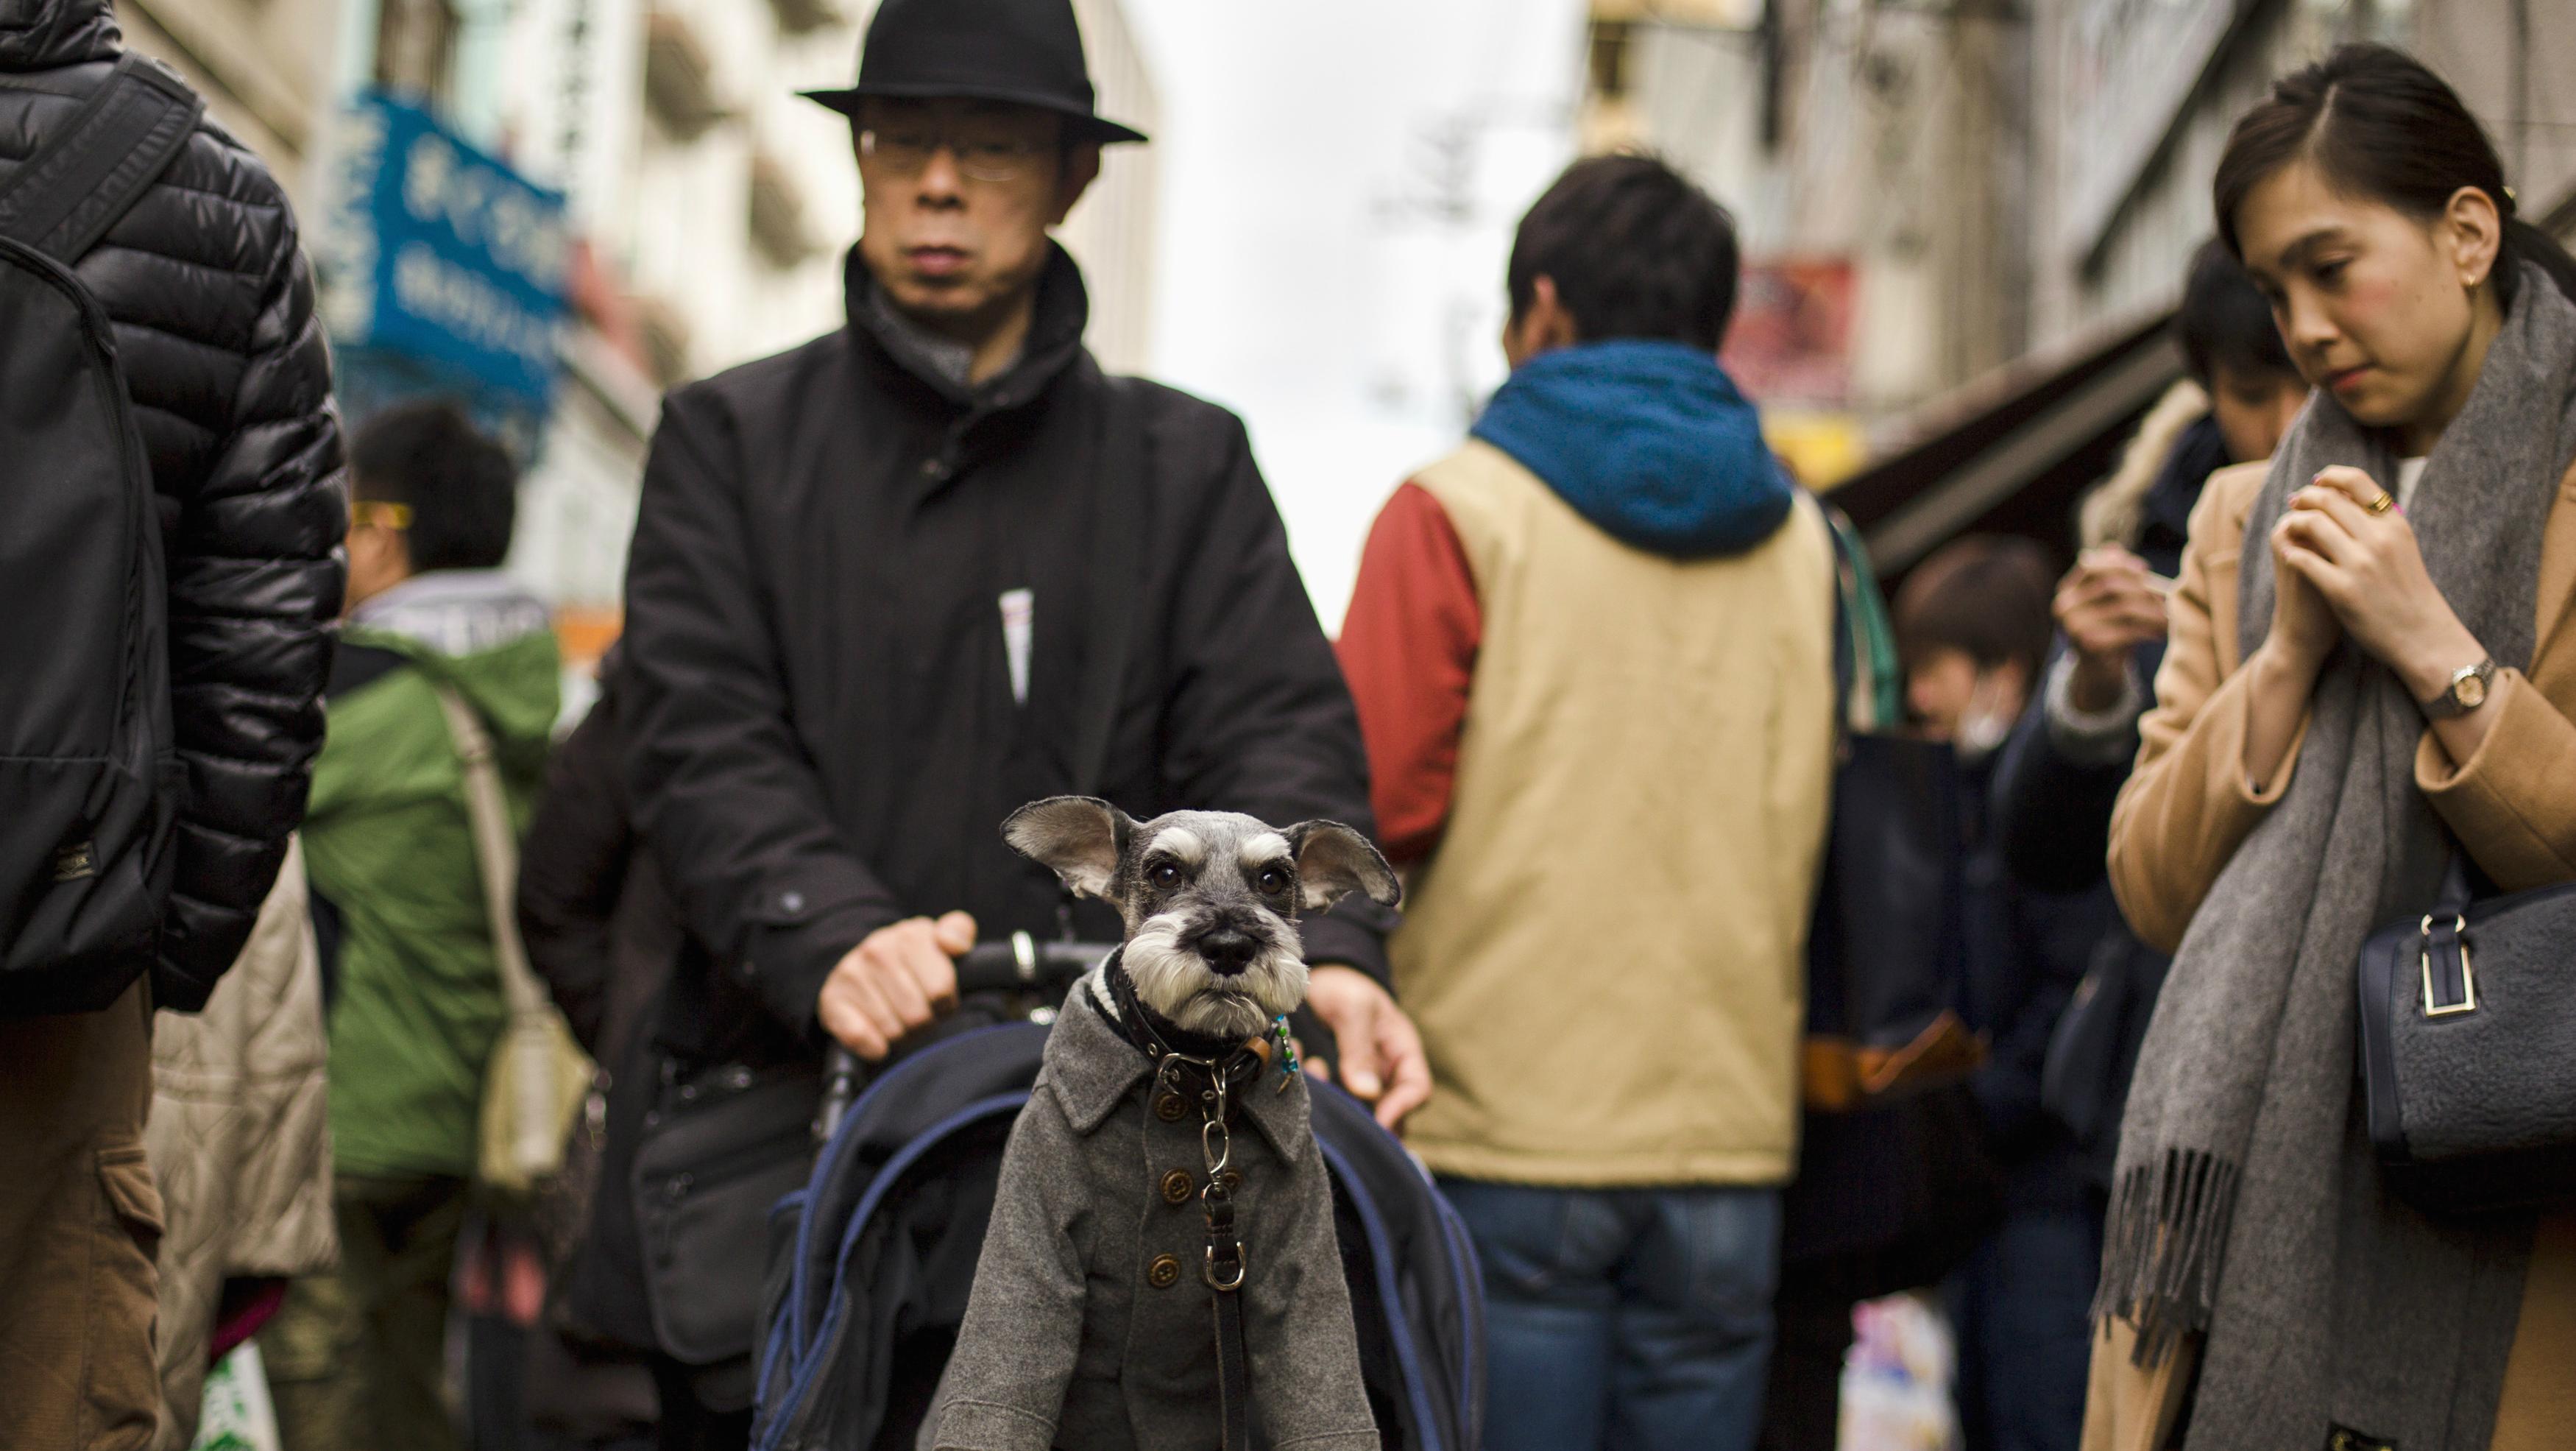 A Japanese man walking a dog in a stroller